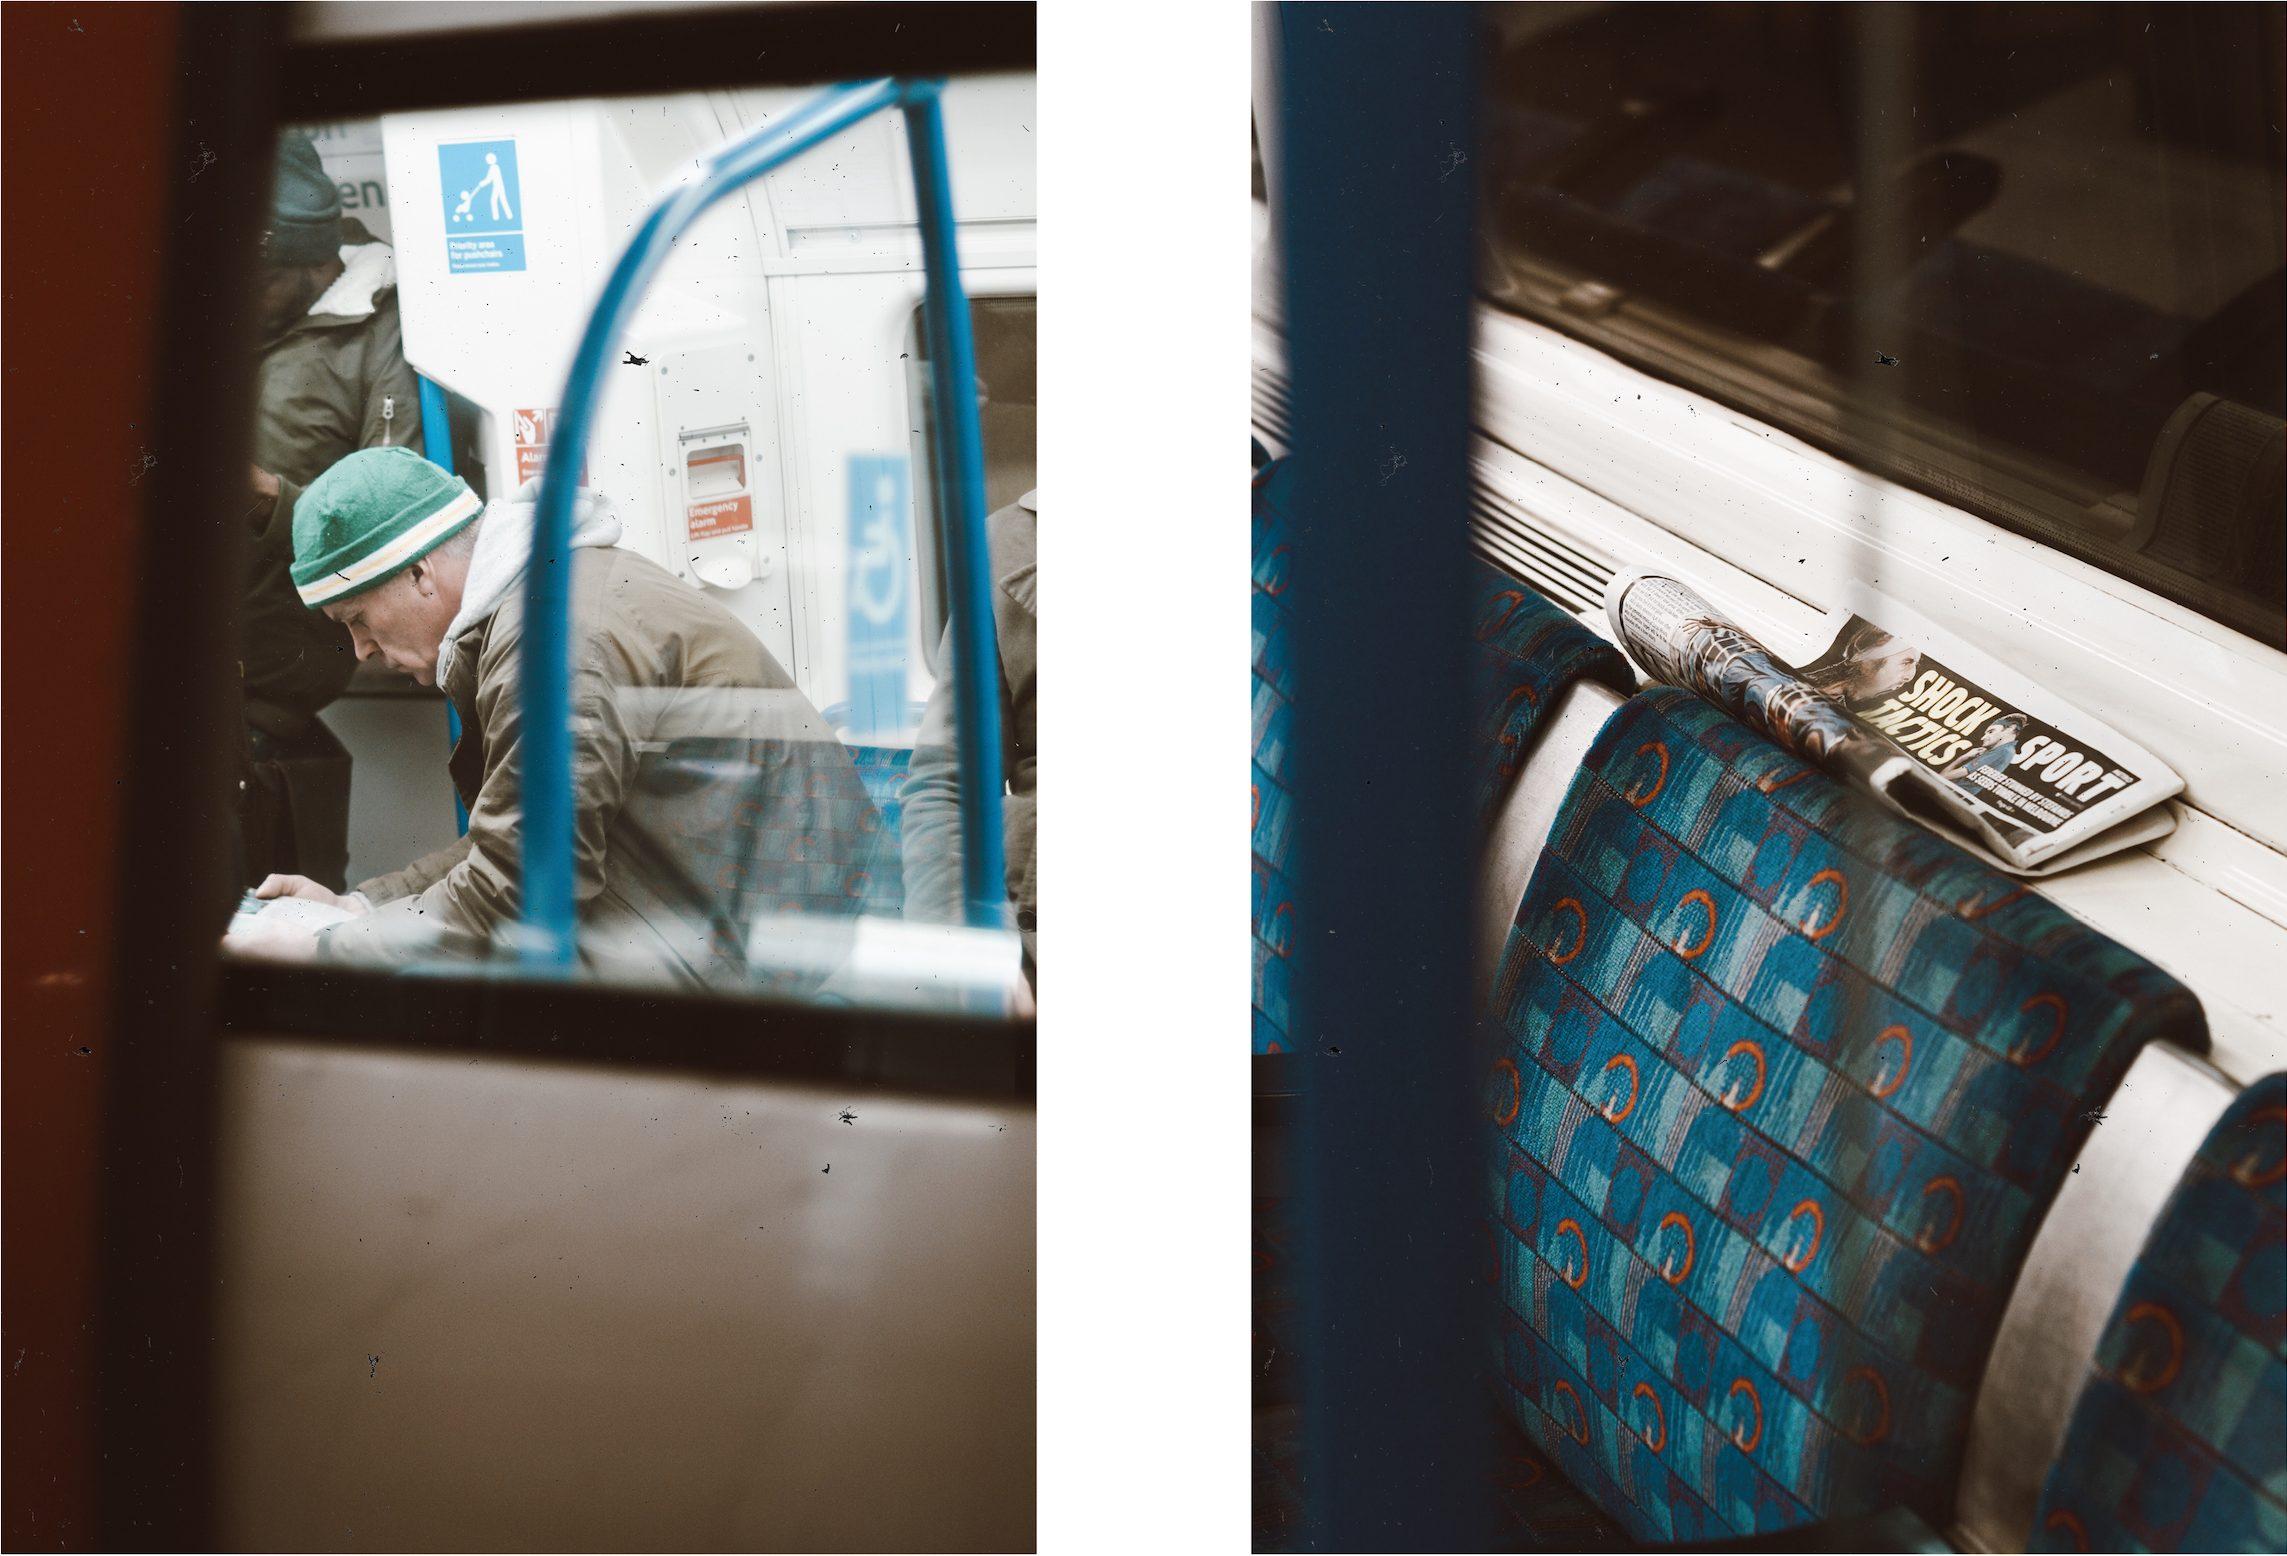 Man reading on the tube [Irene Chirita]